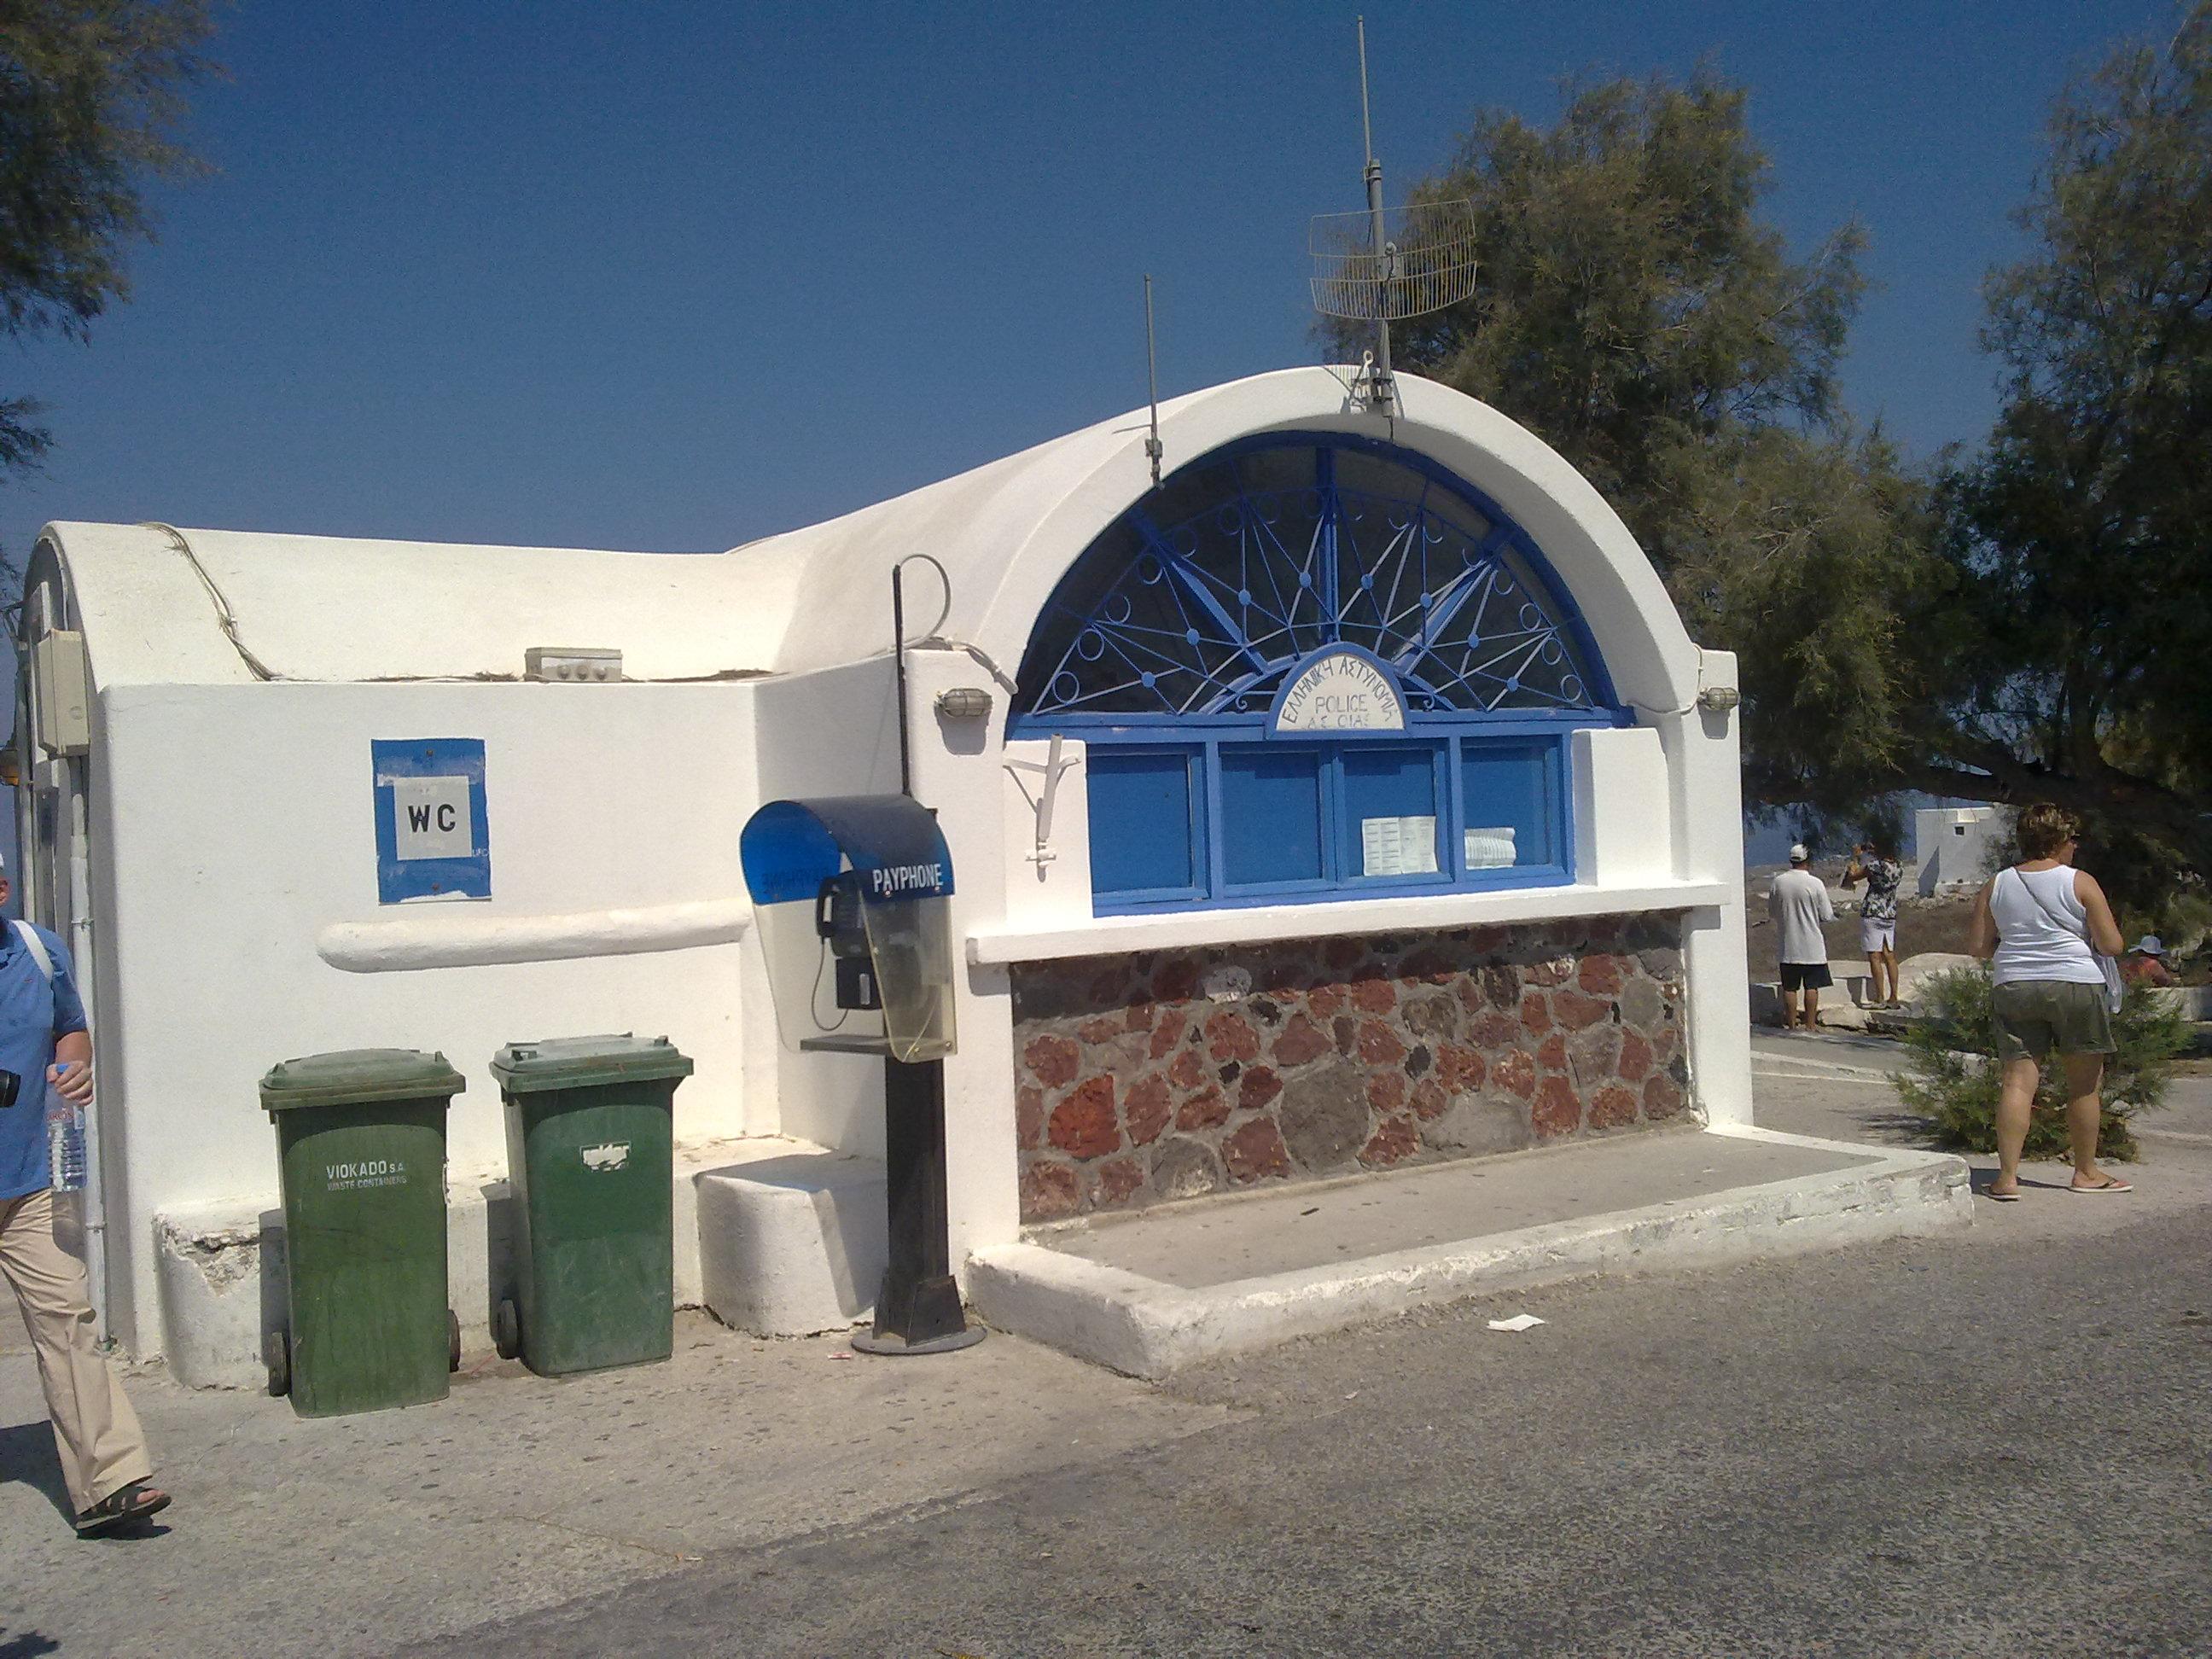 Politia si WC. In Santorini